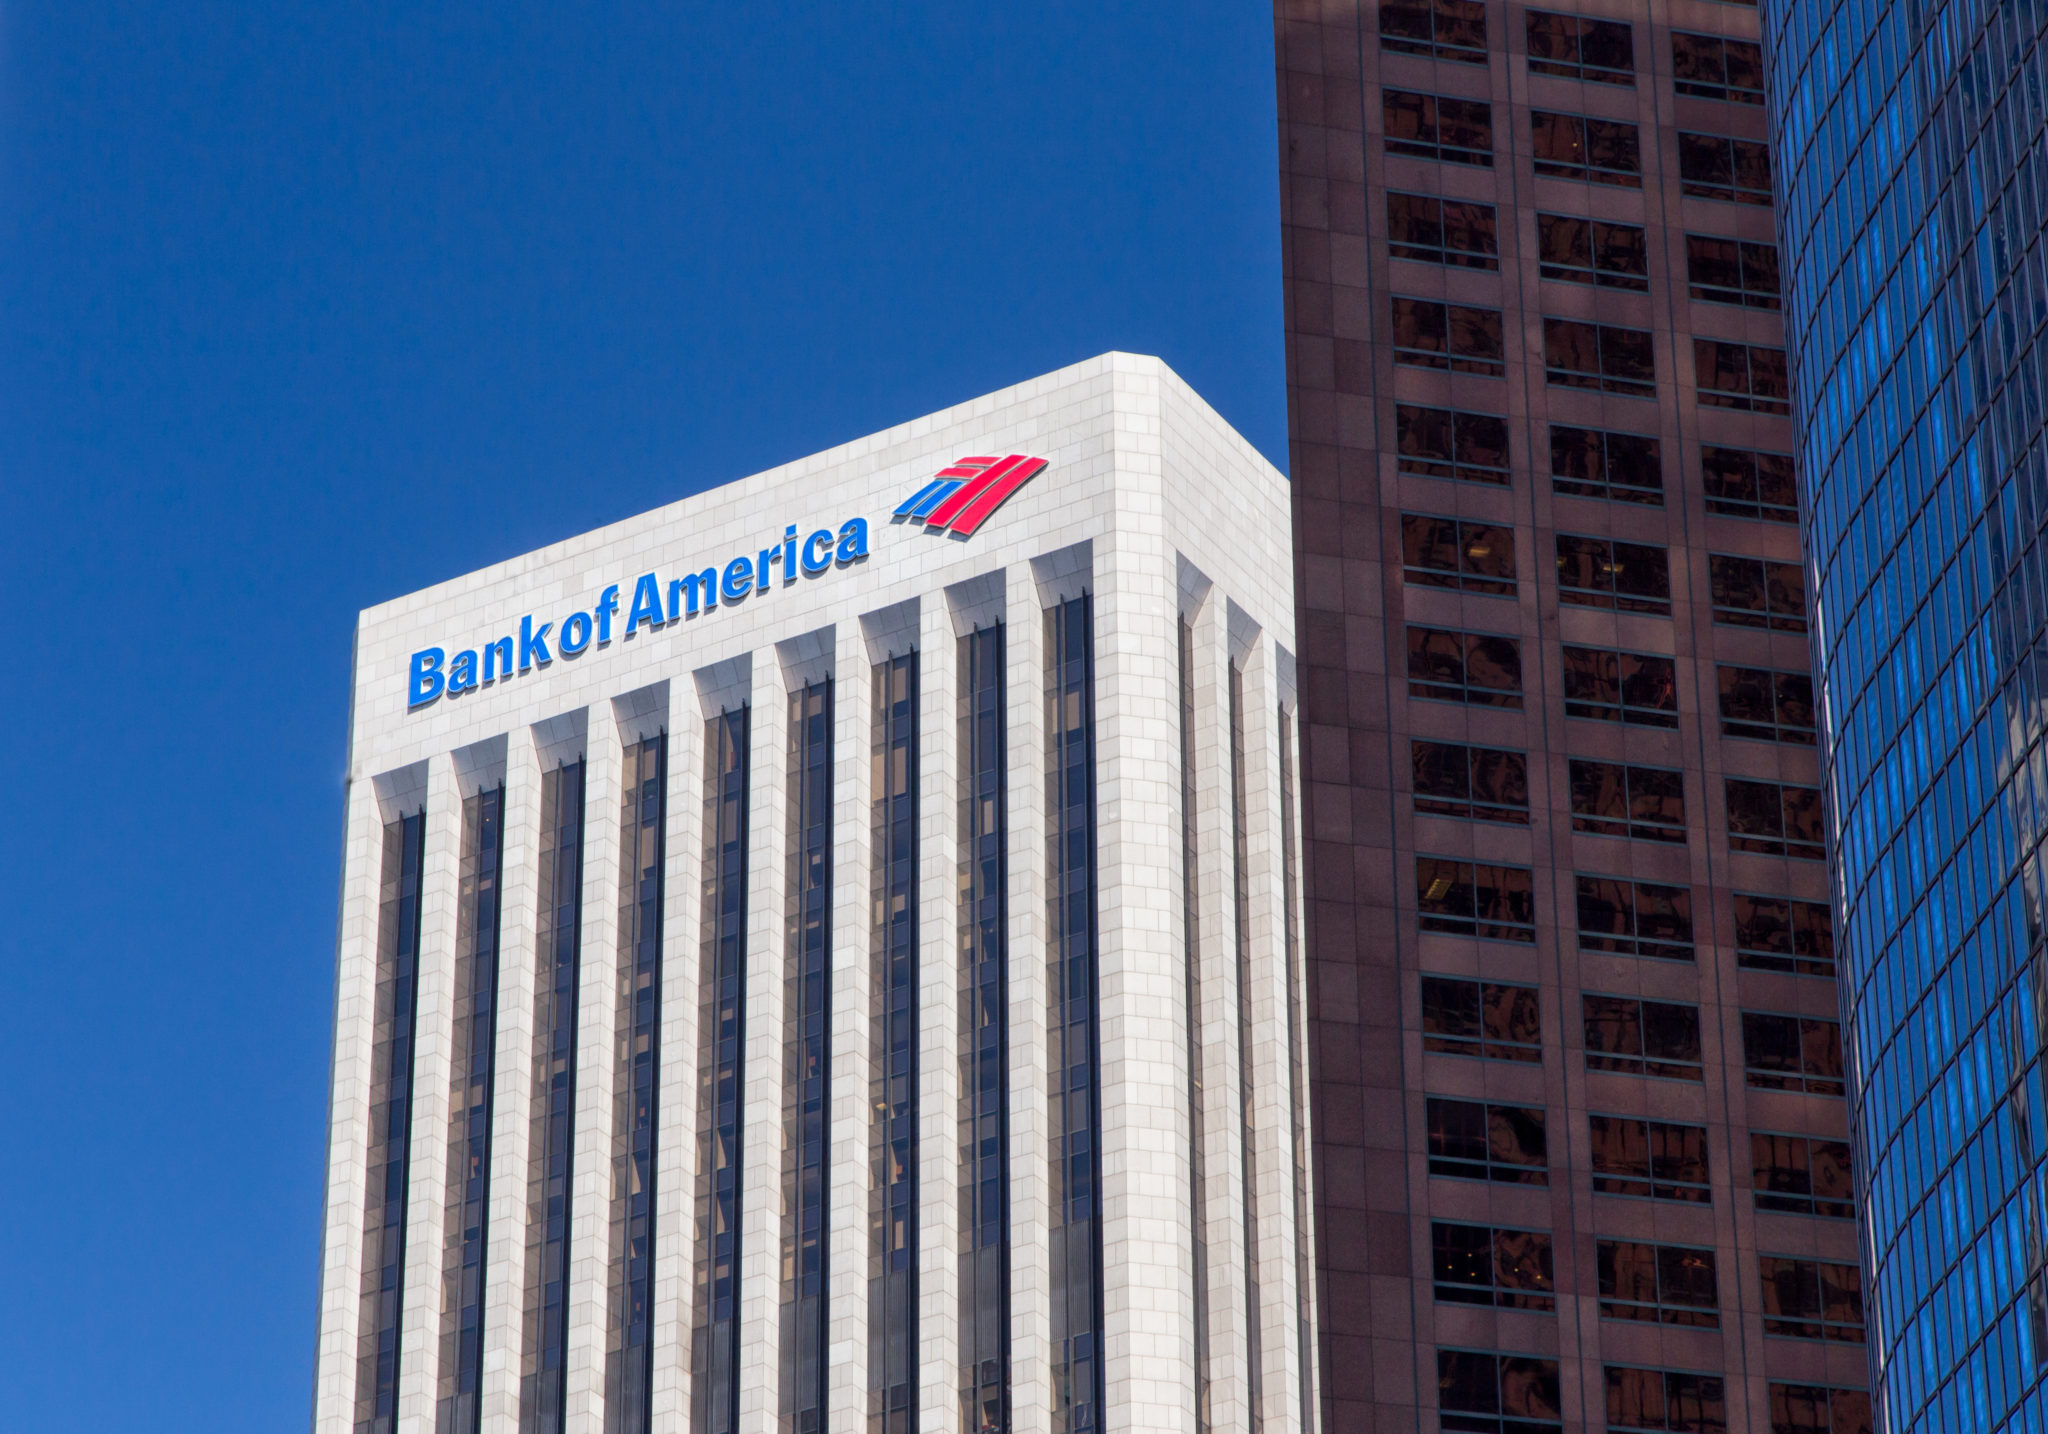 bank of america recent news